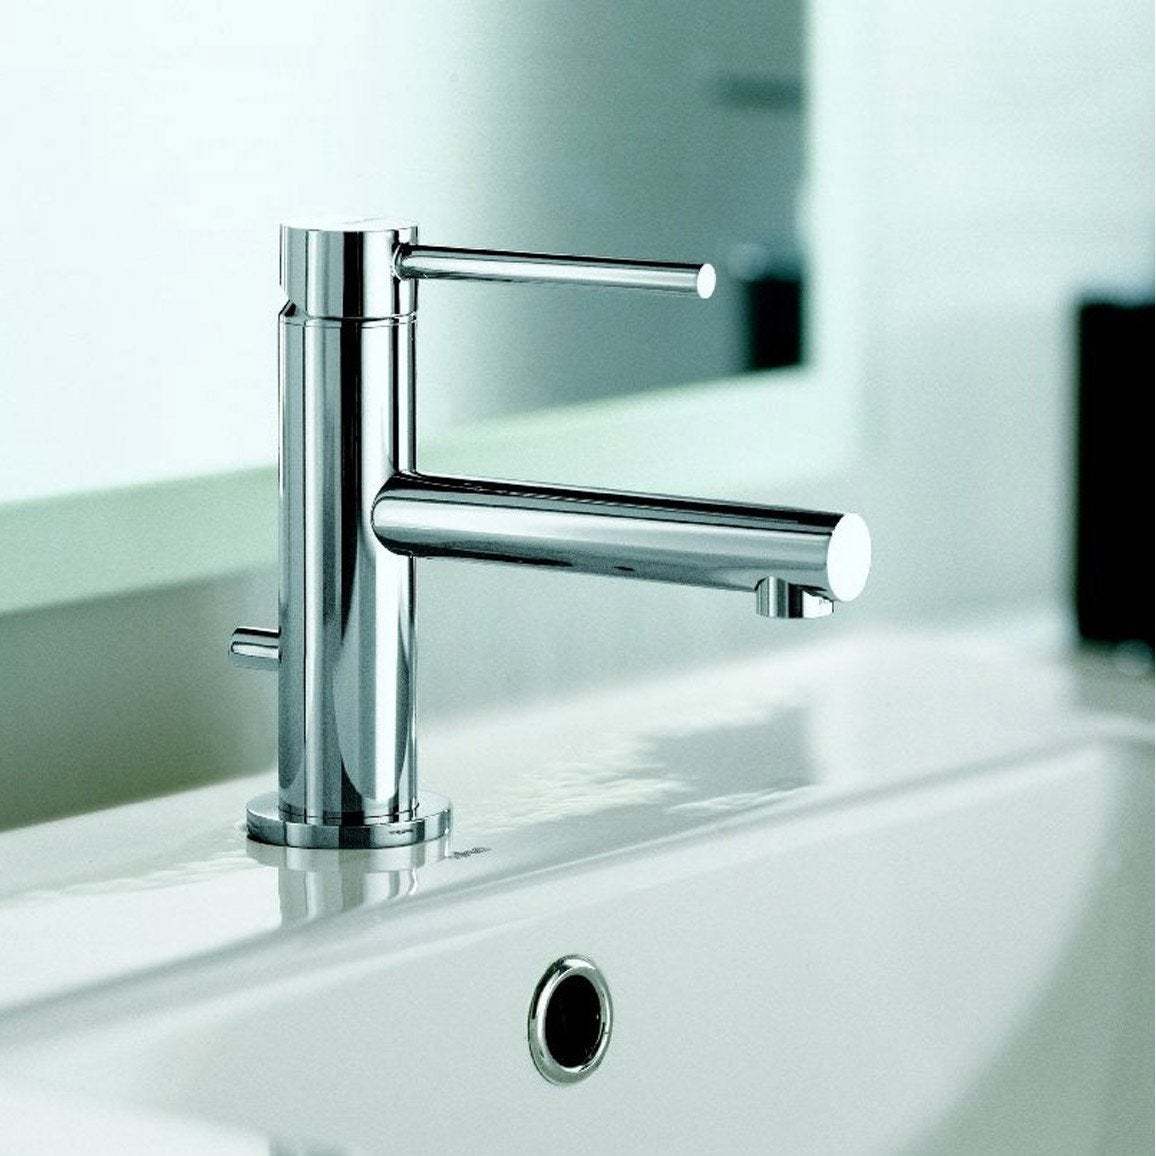 mitigeur lave mains eau chaude froide chrom x tech leroy merlin. Black Bedroom Furniture Sets. Home Design Ideas